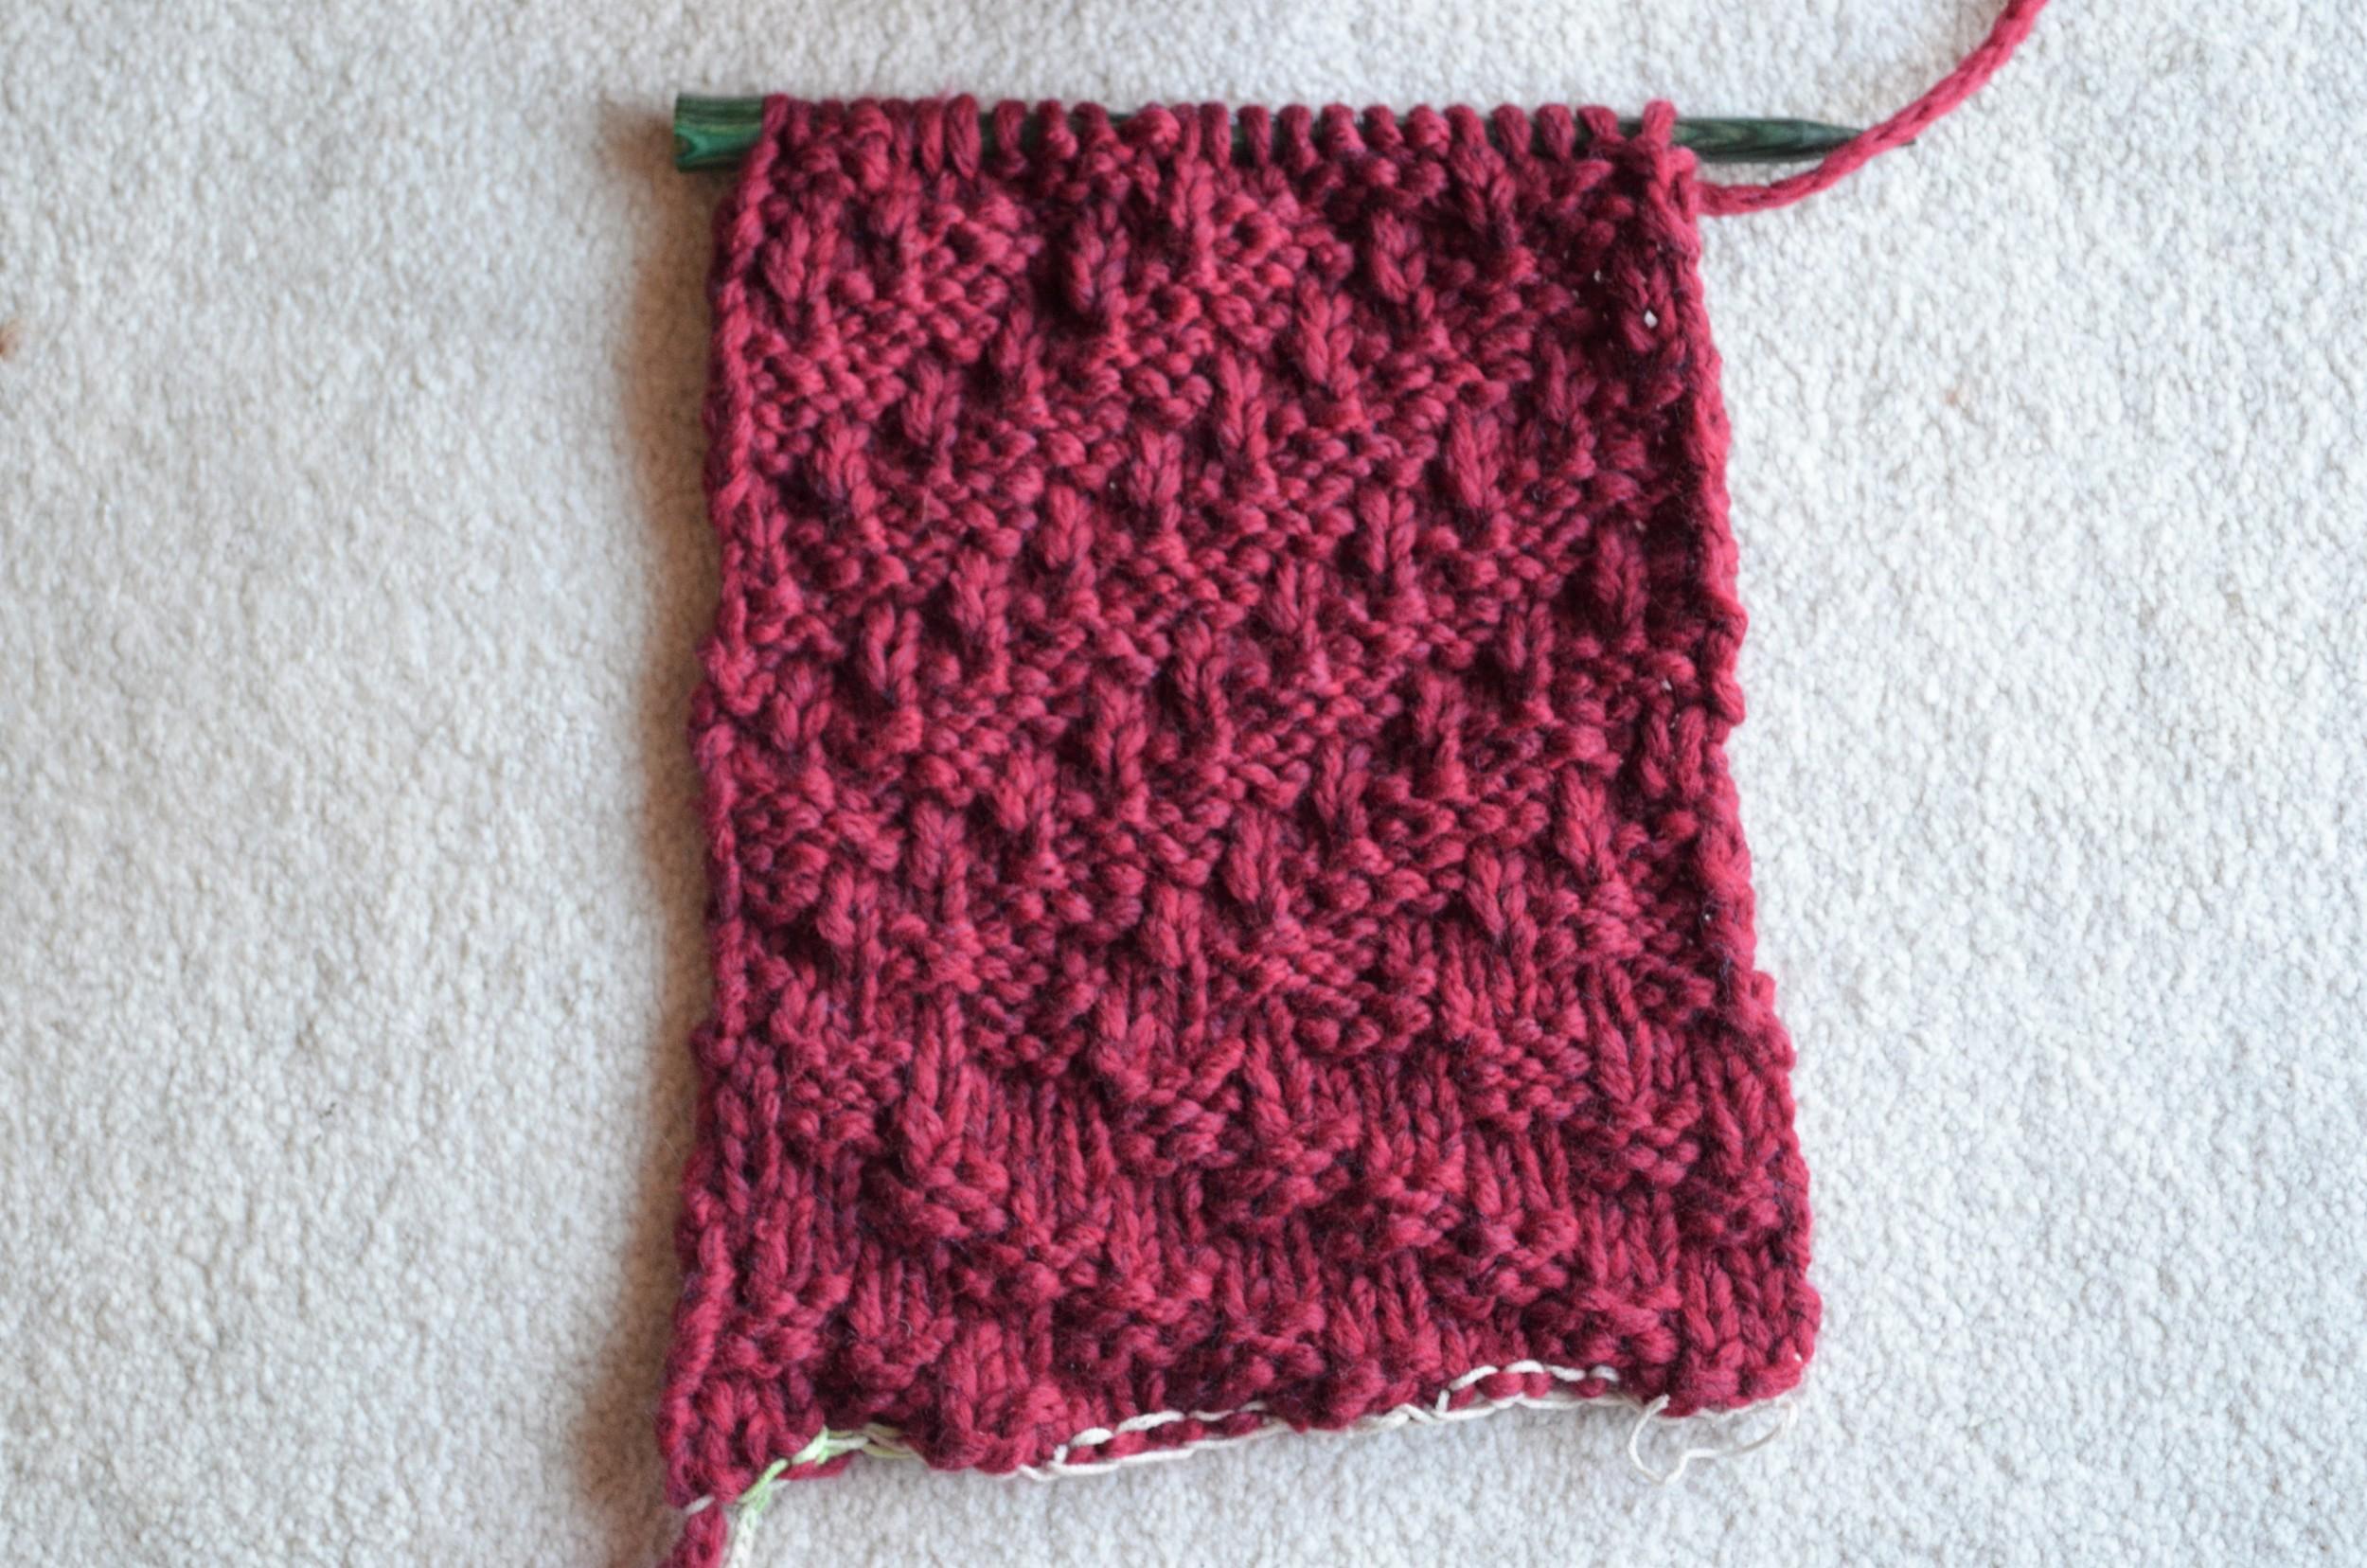 Knitting / warporweft.com